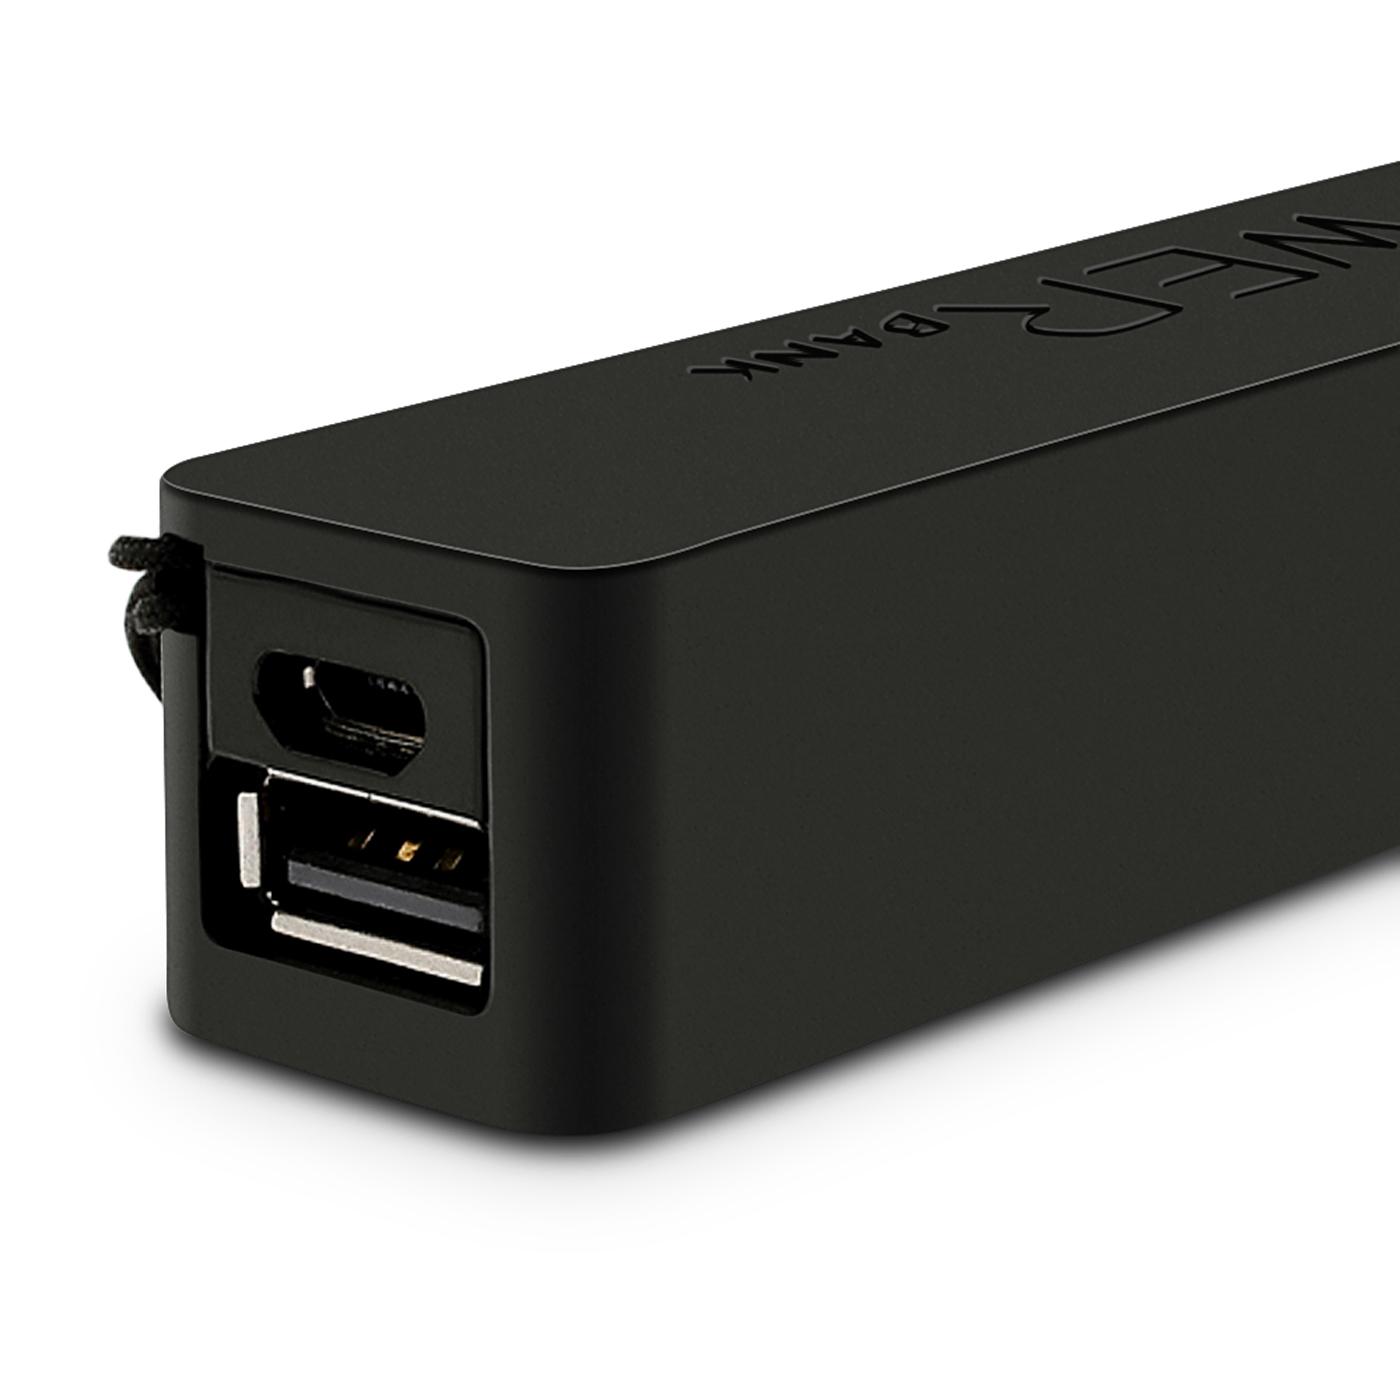 USB-Power-Bank-Caricatore-Caricabatterie-Portatile-con-portachiavi-Per-Cellulare